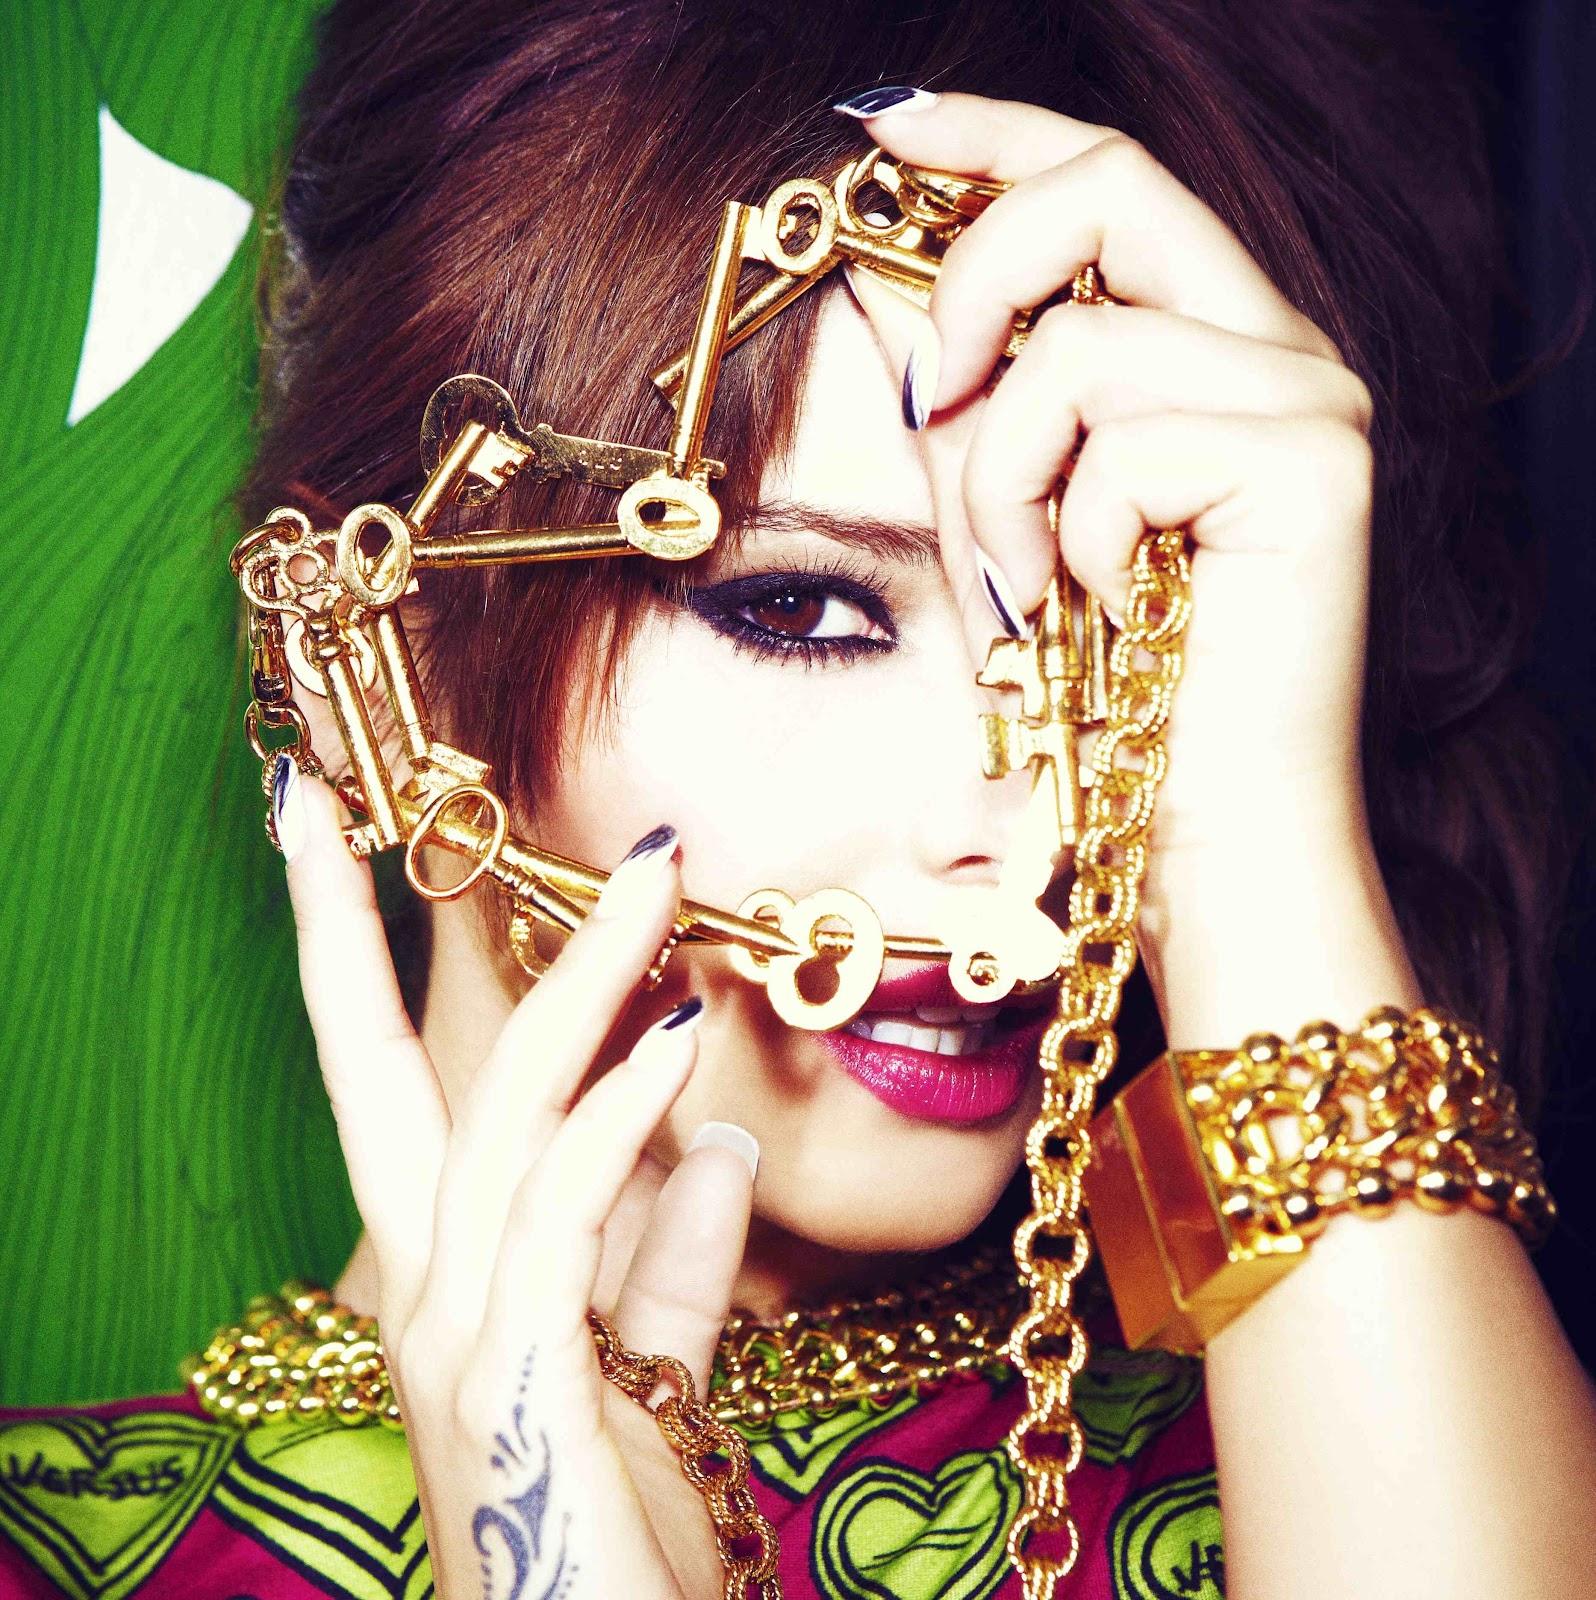 http://4.bp.blogspot.com/-rVvXiqQlaWU/T47JFOnQgxI/AAAAAAAADGo/r5vb24yFGdc/s1600/Cheryl-.jpg